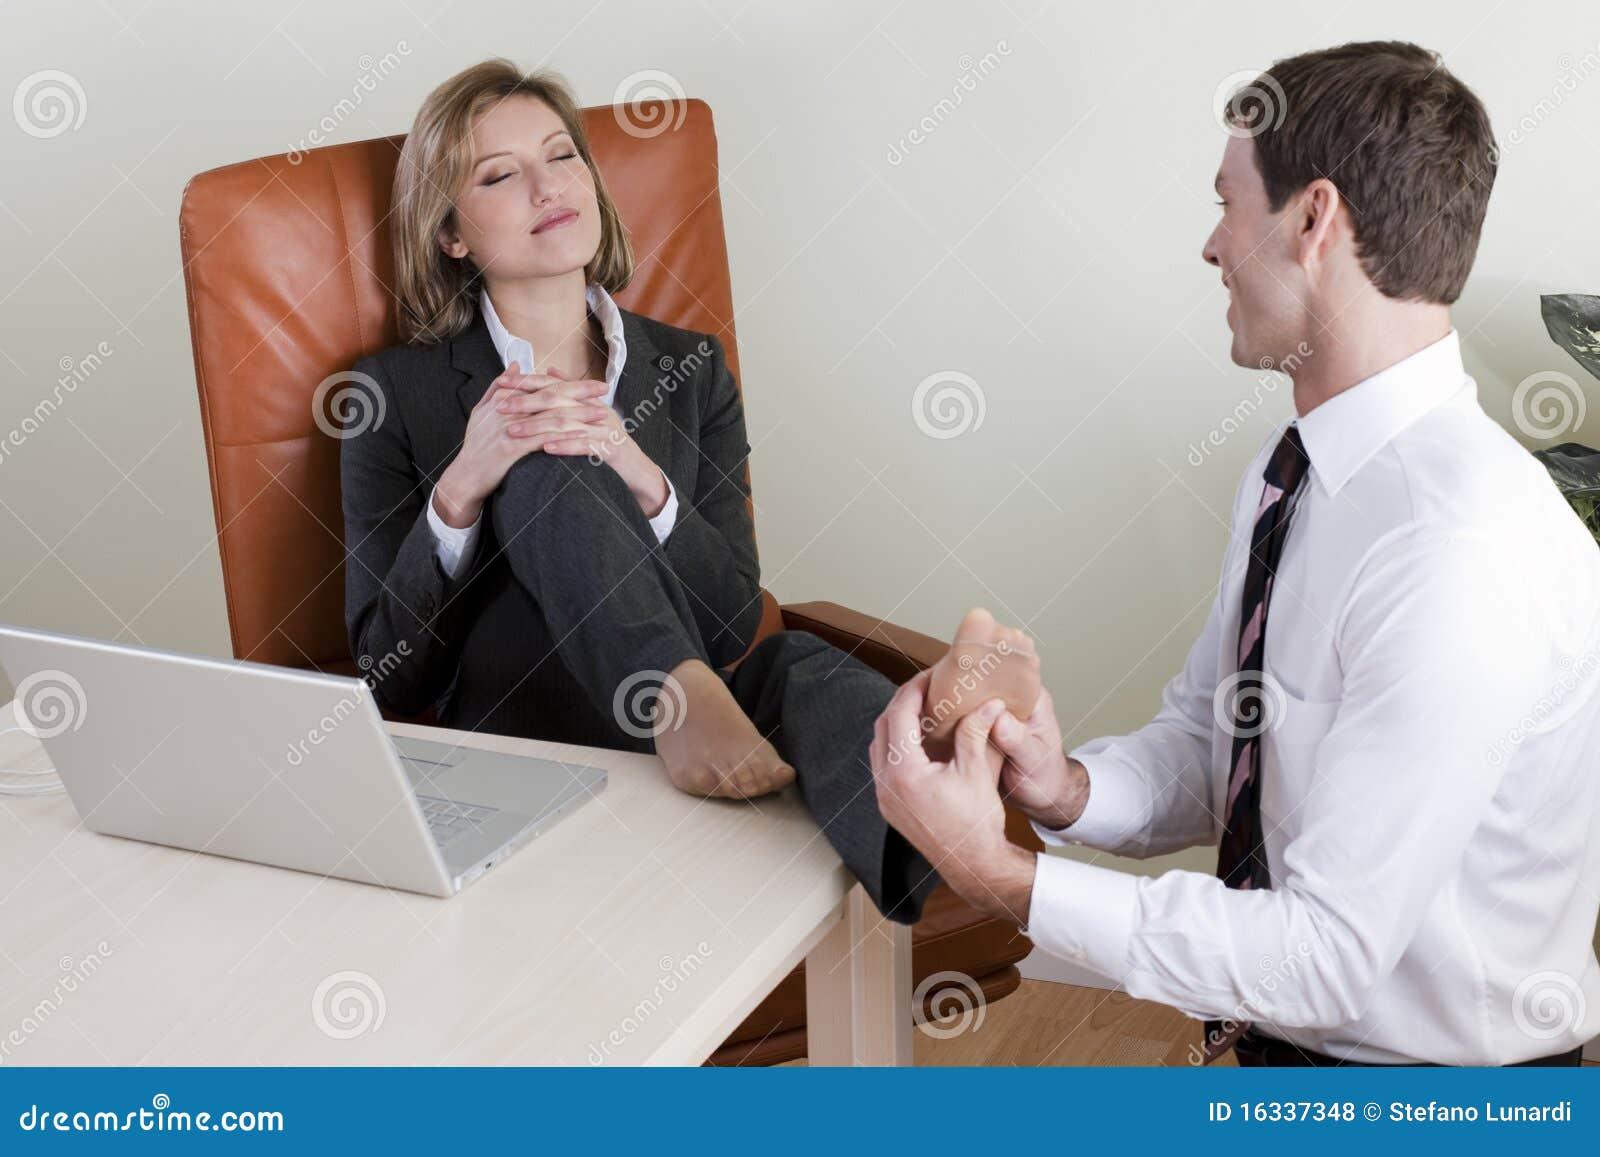 Foot Worship Under Table : Pantyhose Feet On Desk - Hot Girls Wallpaper